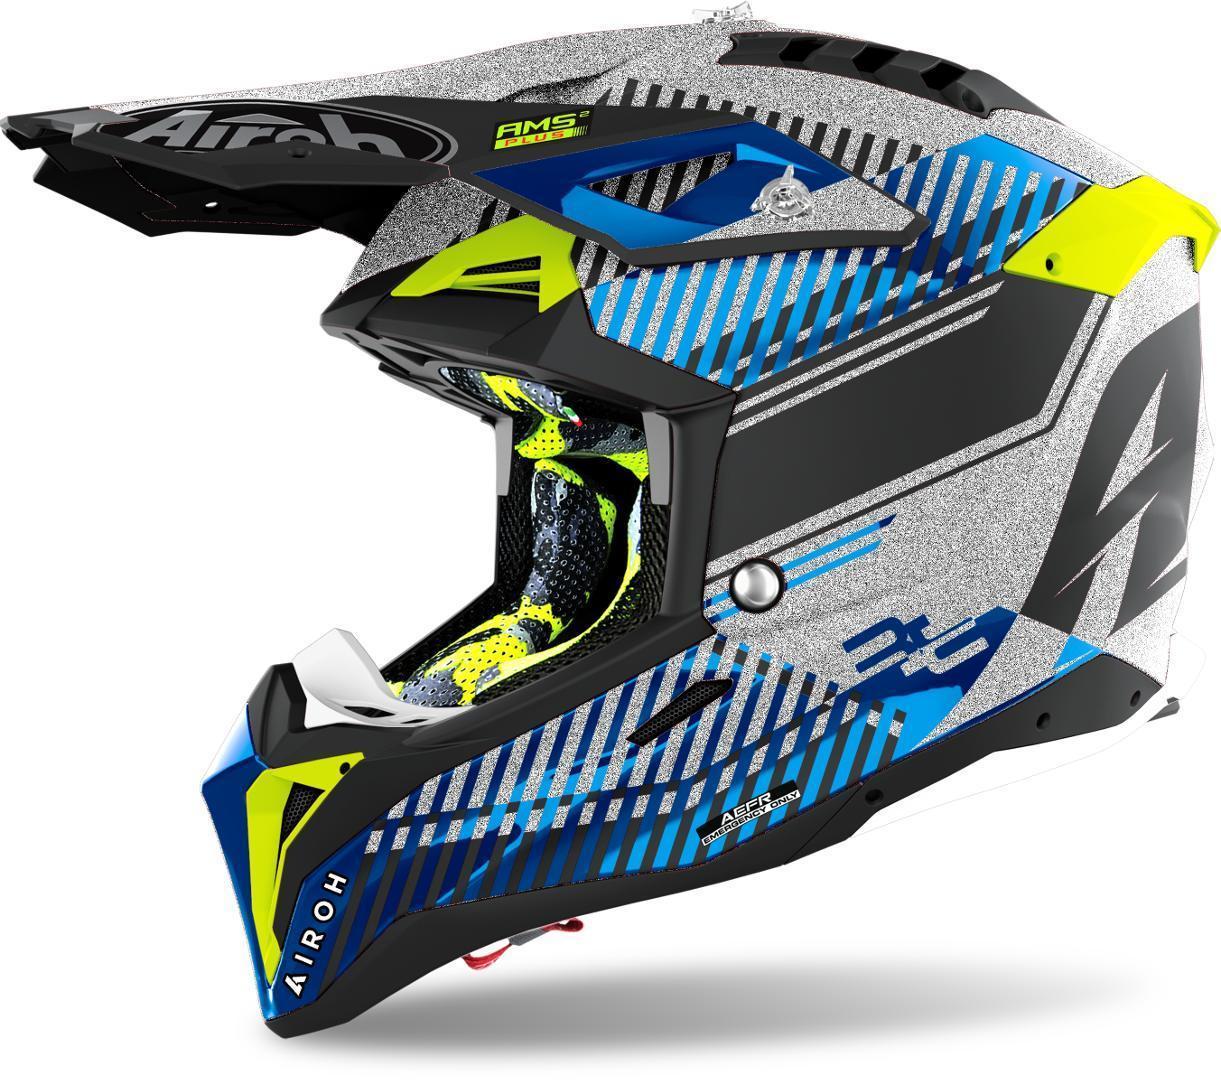 Airoh Aviator 3 Wave Carbon Motocross Helm, silber, Größe XL, silber, Größe XL